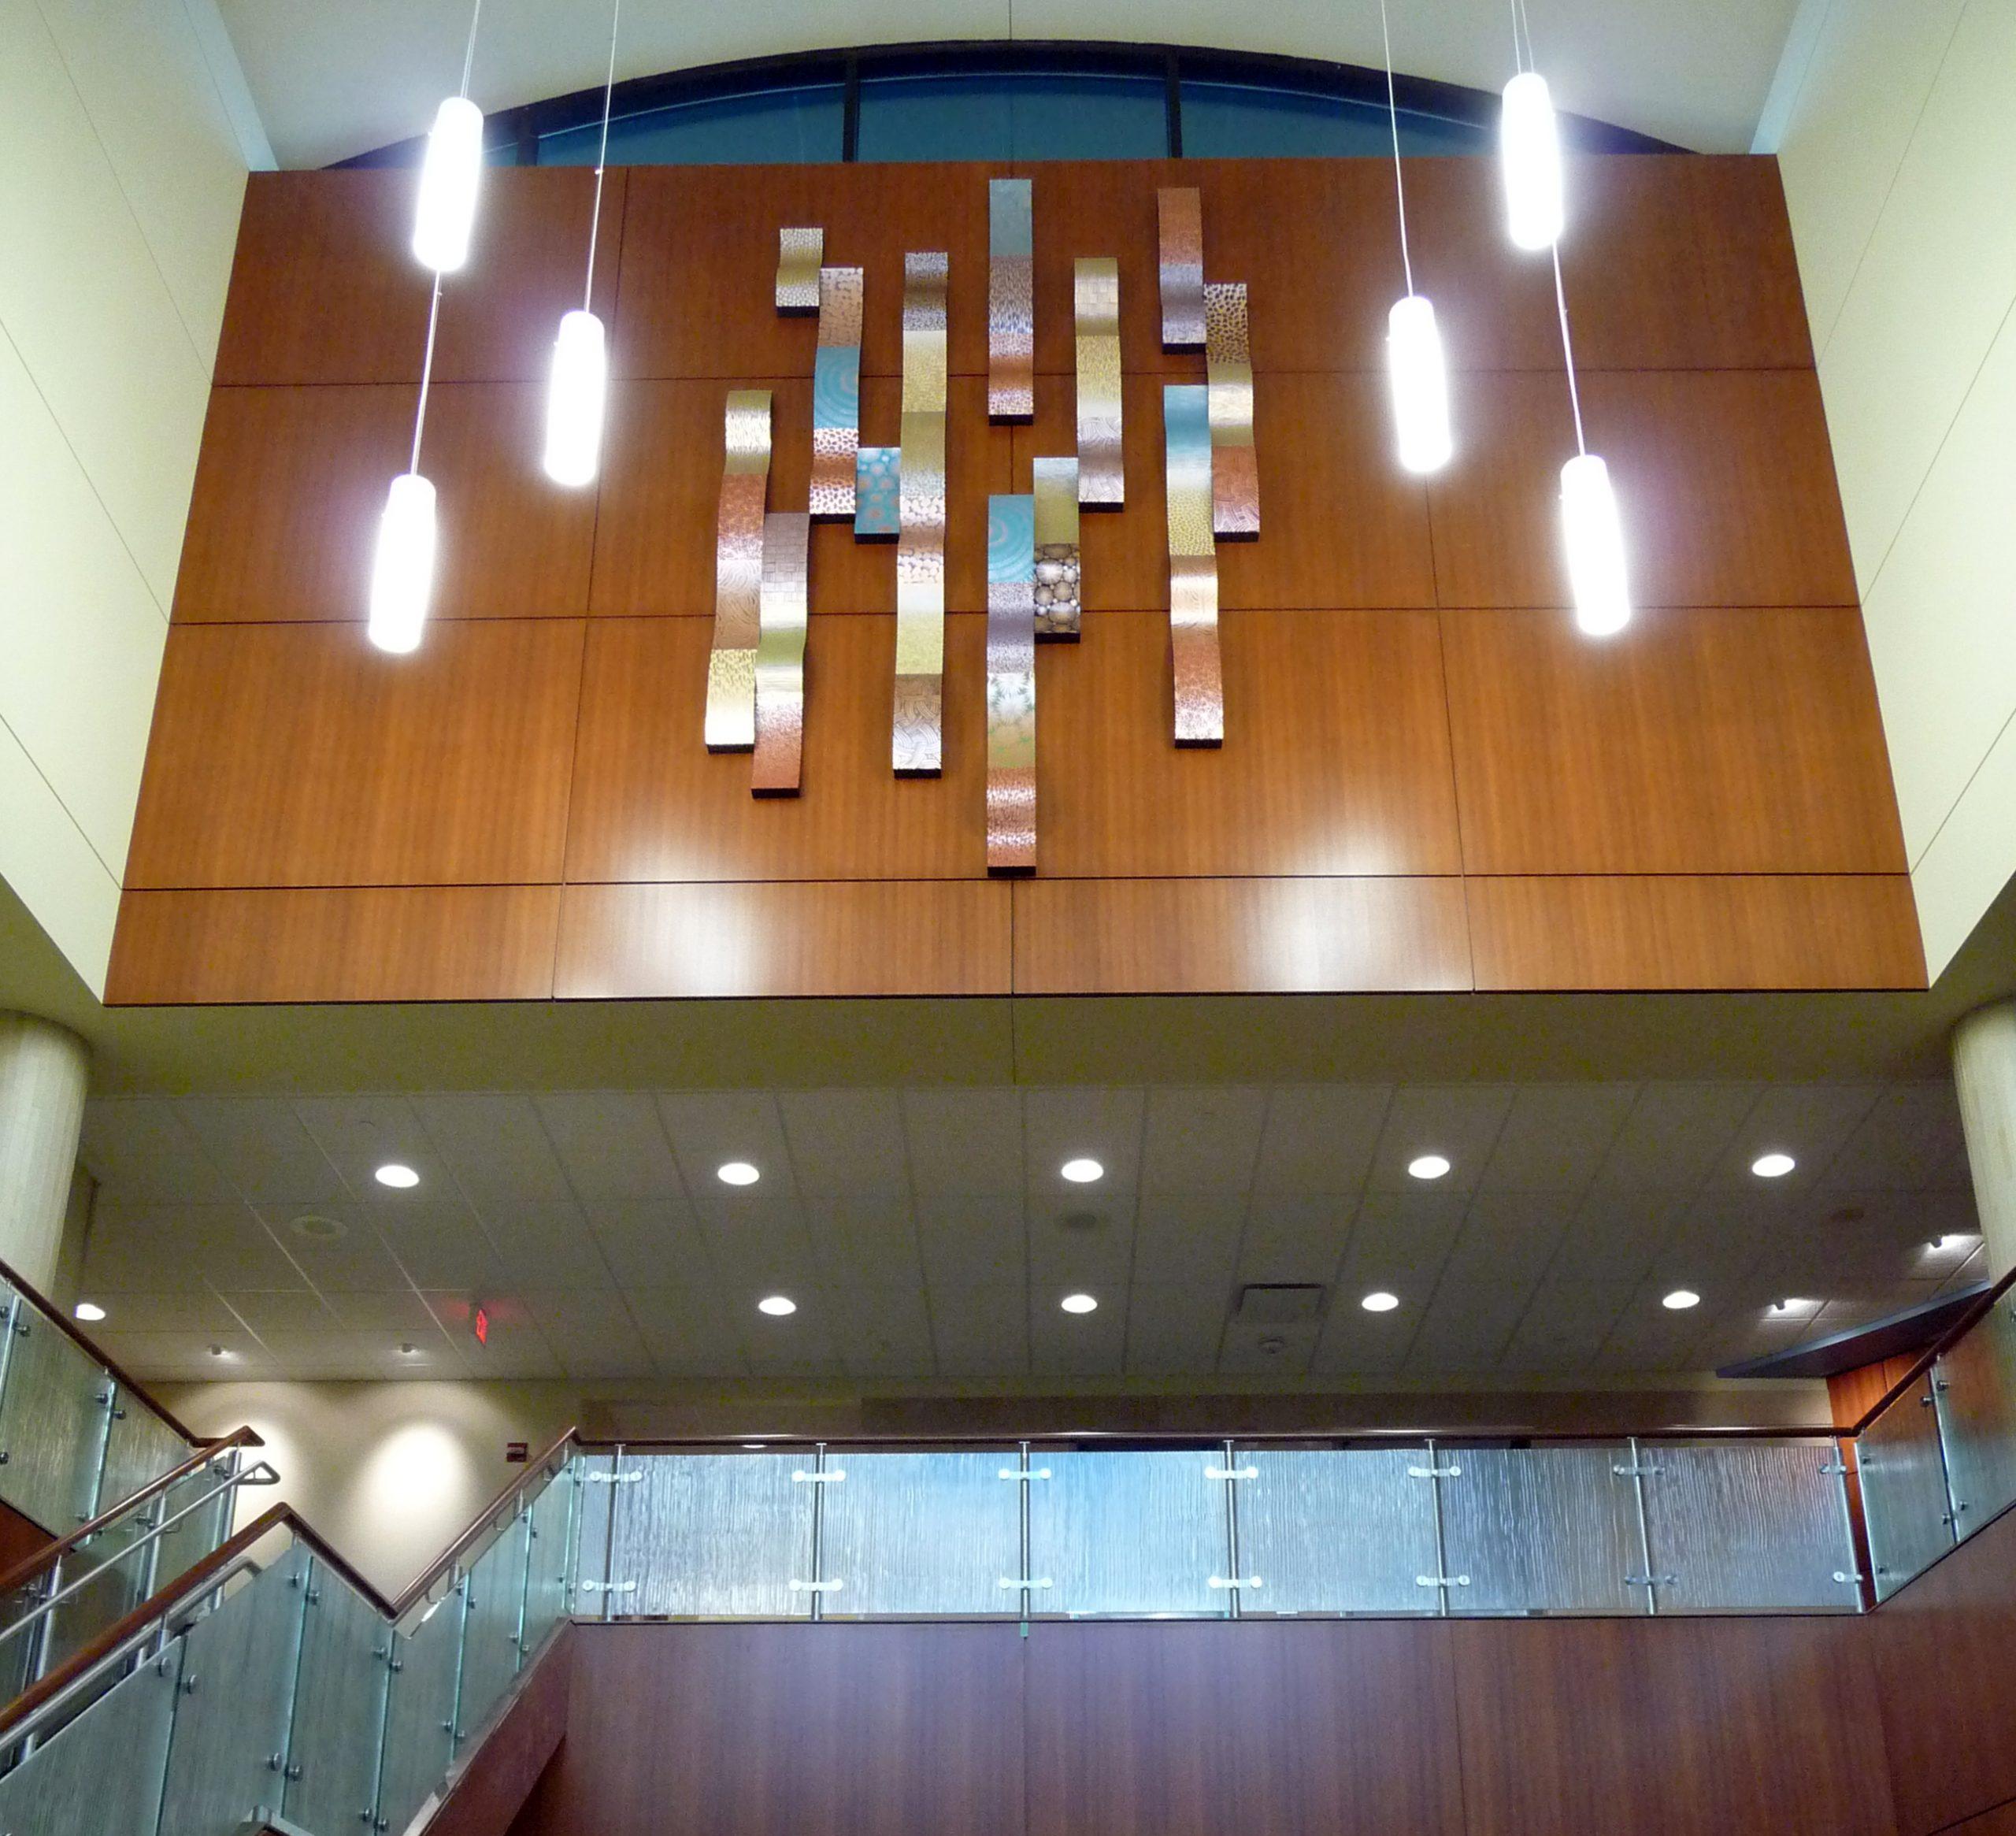 St. Mercy Hospital